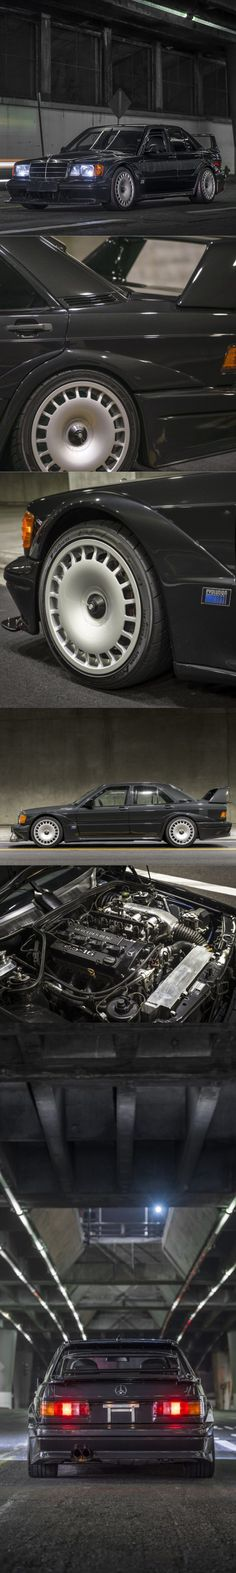 1990 Mercedes-Benz 190E 2.5-16 Evo 2 / 502pcs / 235hp / Germany / black / homologation / Silodrome.com